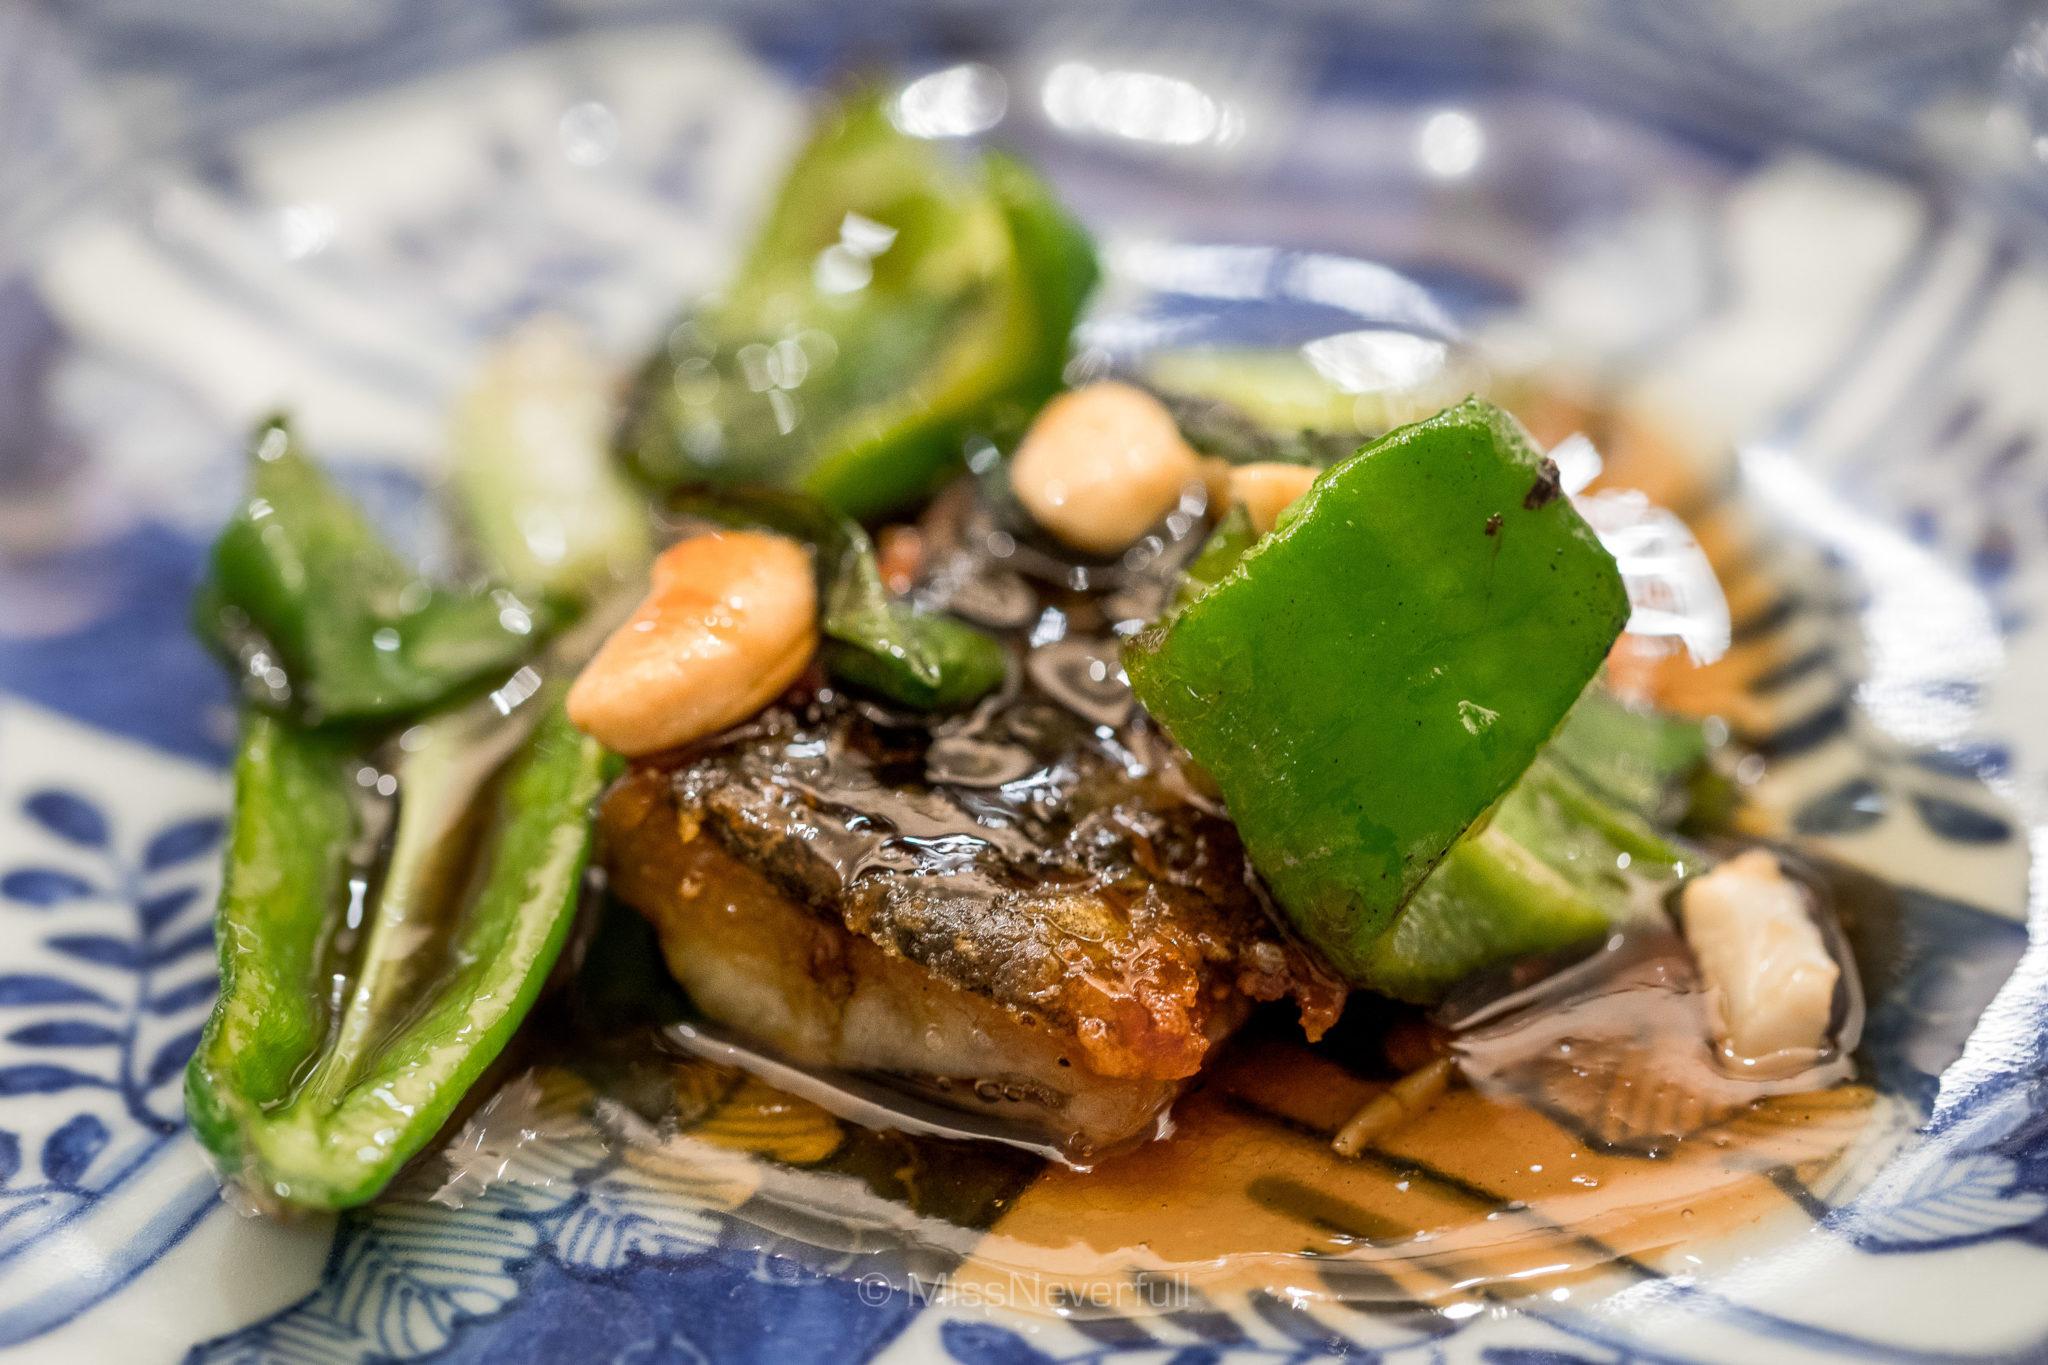 2. Natural eel from Shizuoka, pepper and sweet vinegar sauce (天然鰻の甘酢唐辛子 )